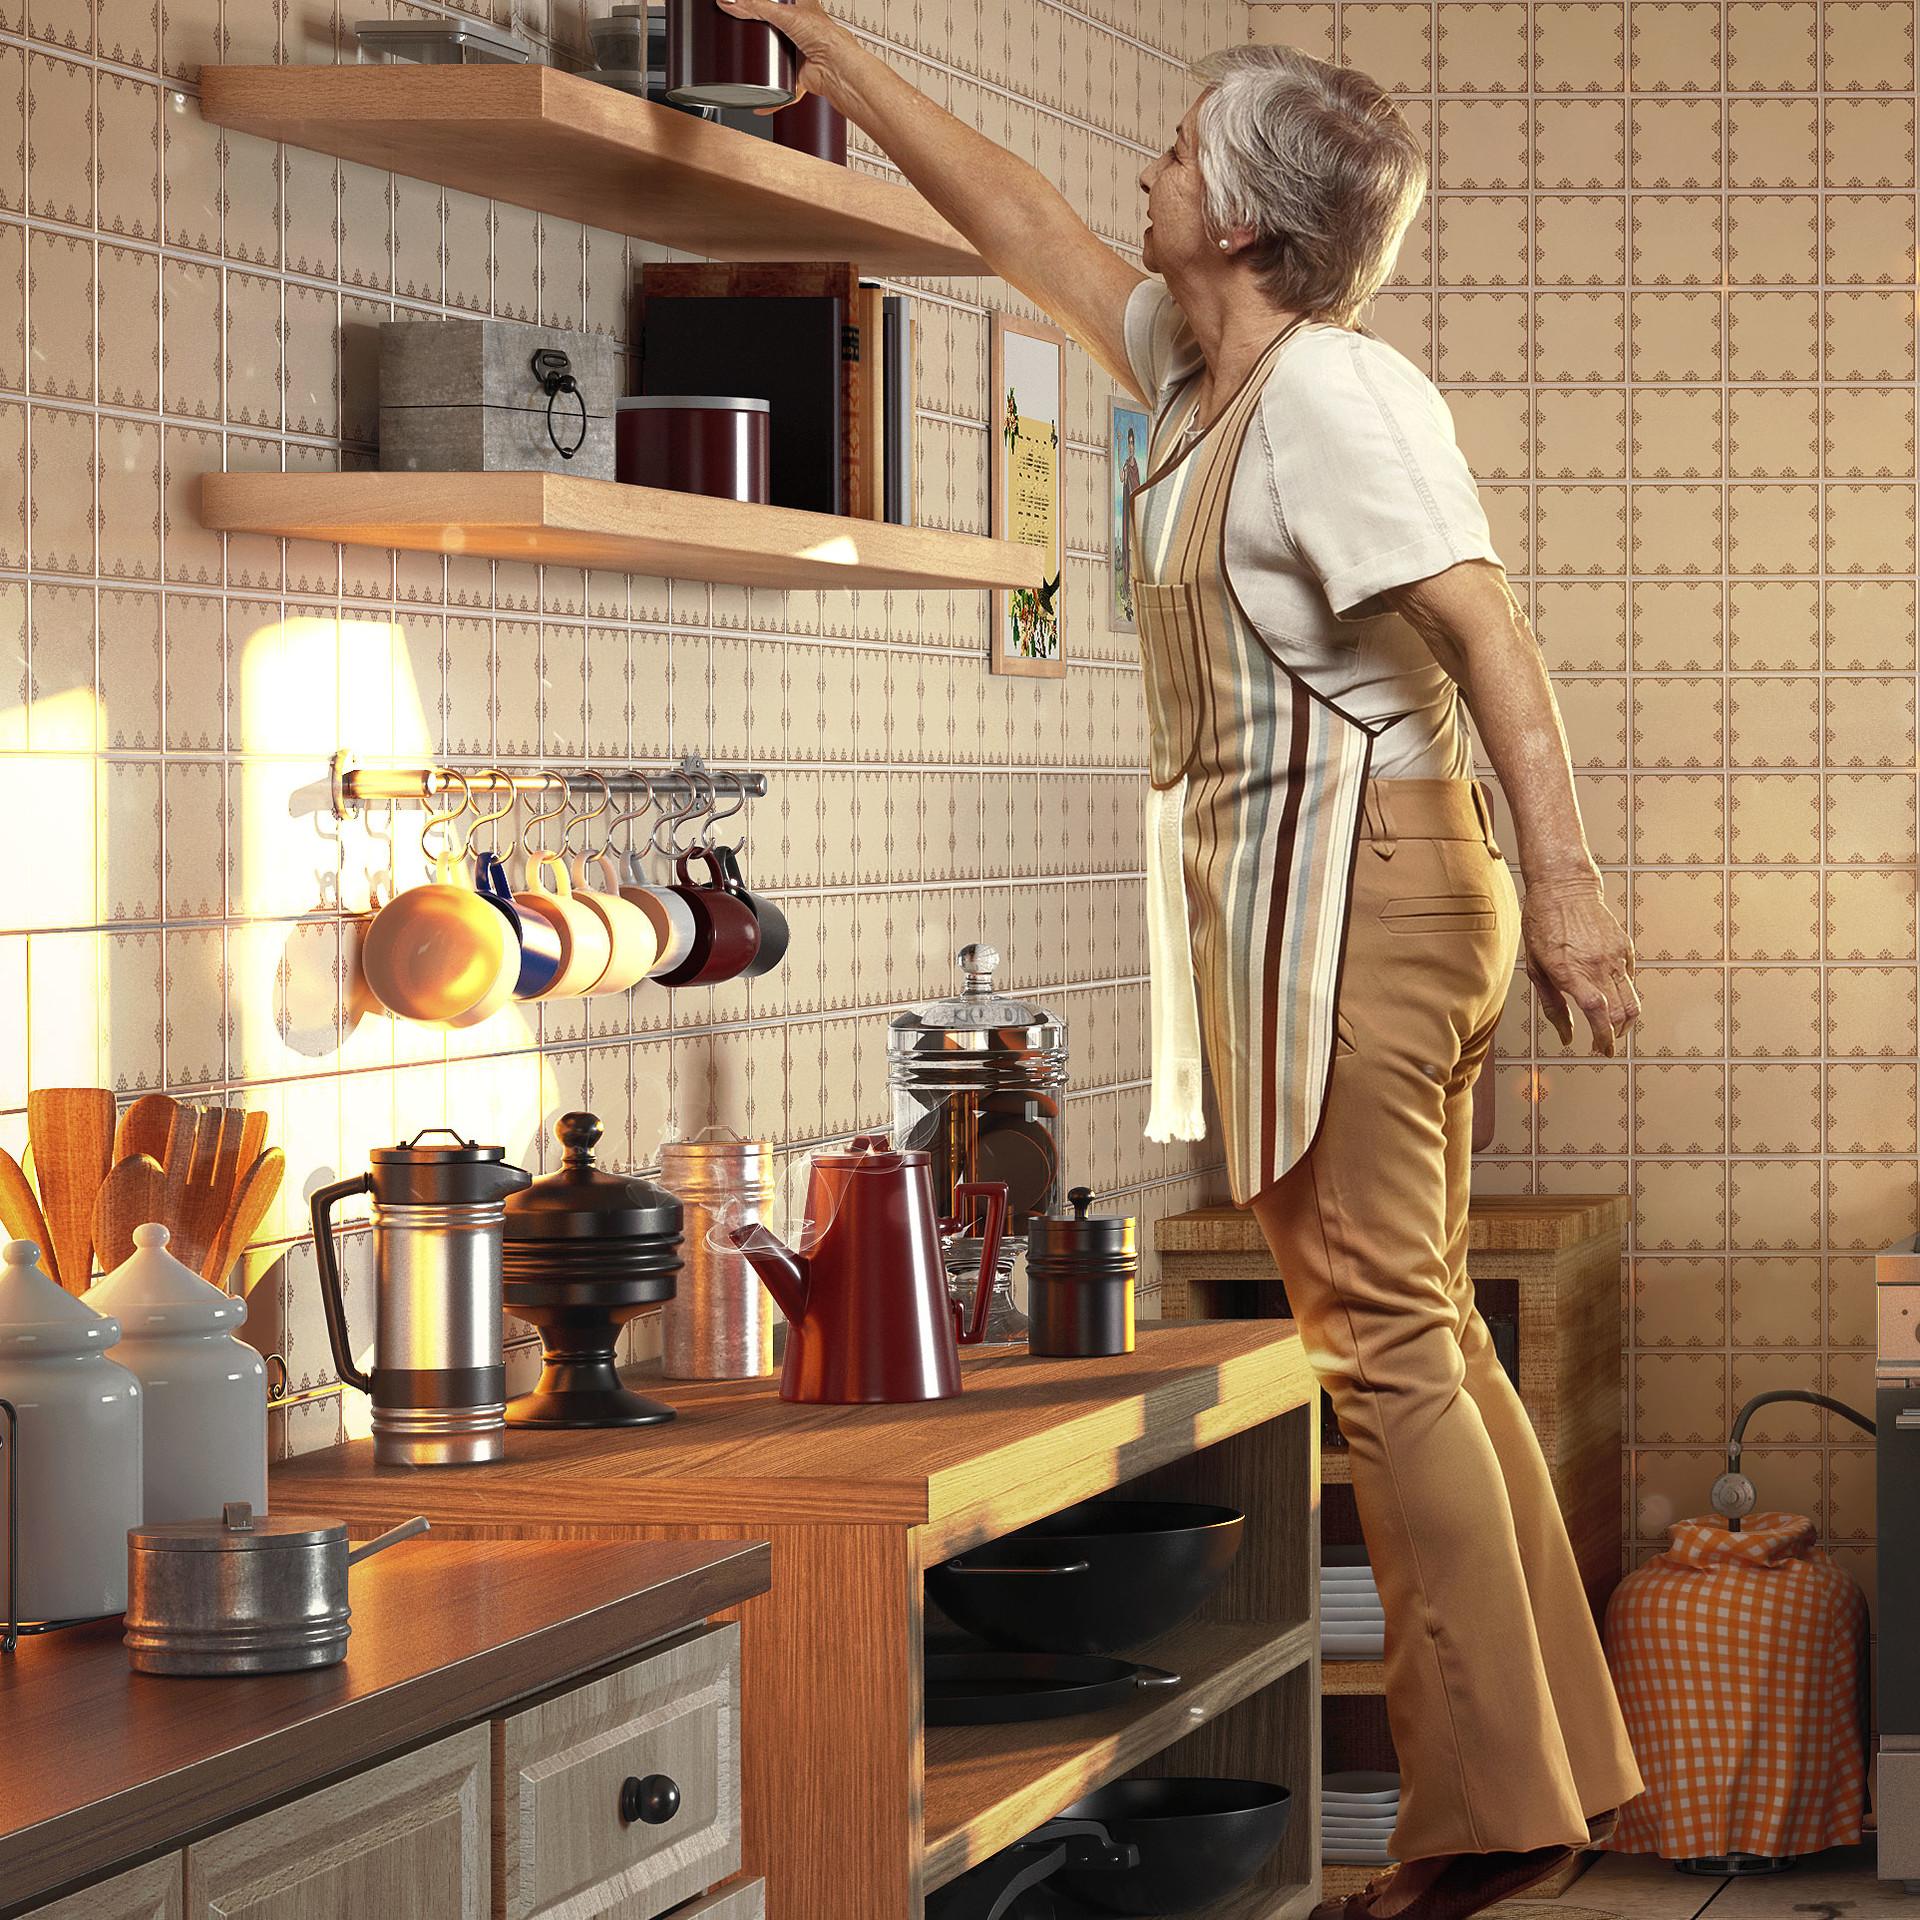 Luis ramos cozinha3 copy2